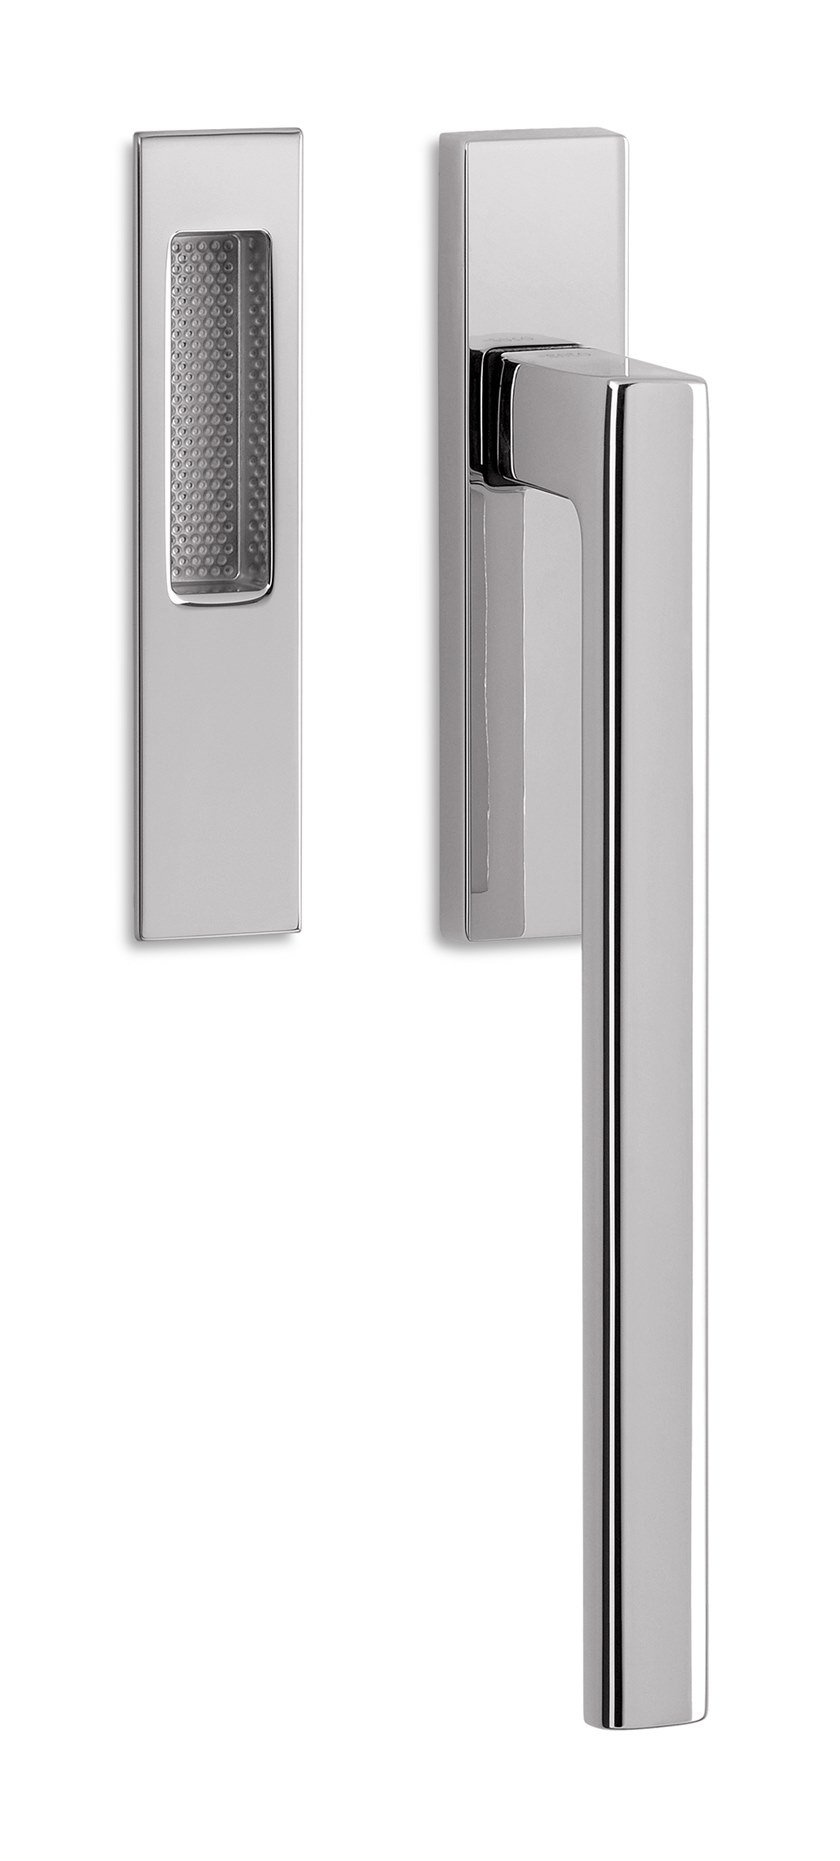 DK window handle on back plate UNIT | Window handle by Ento